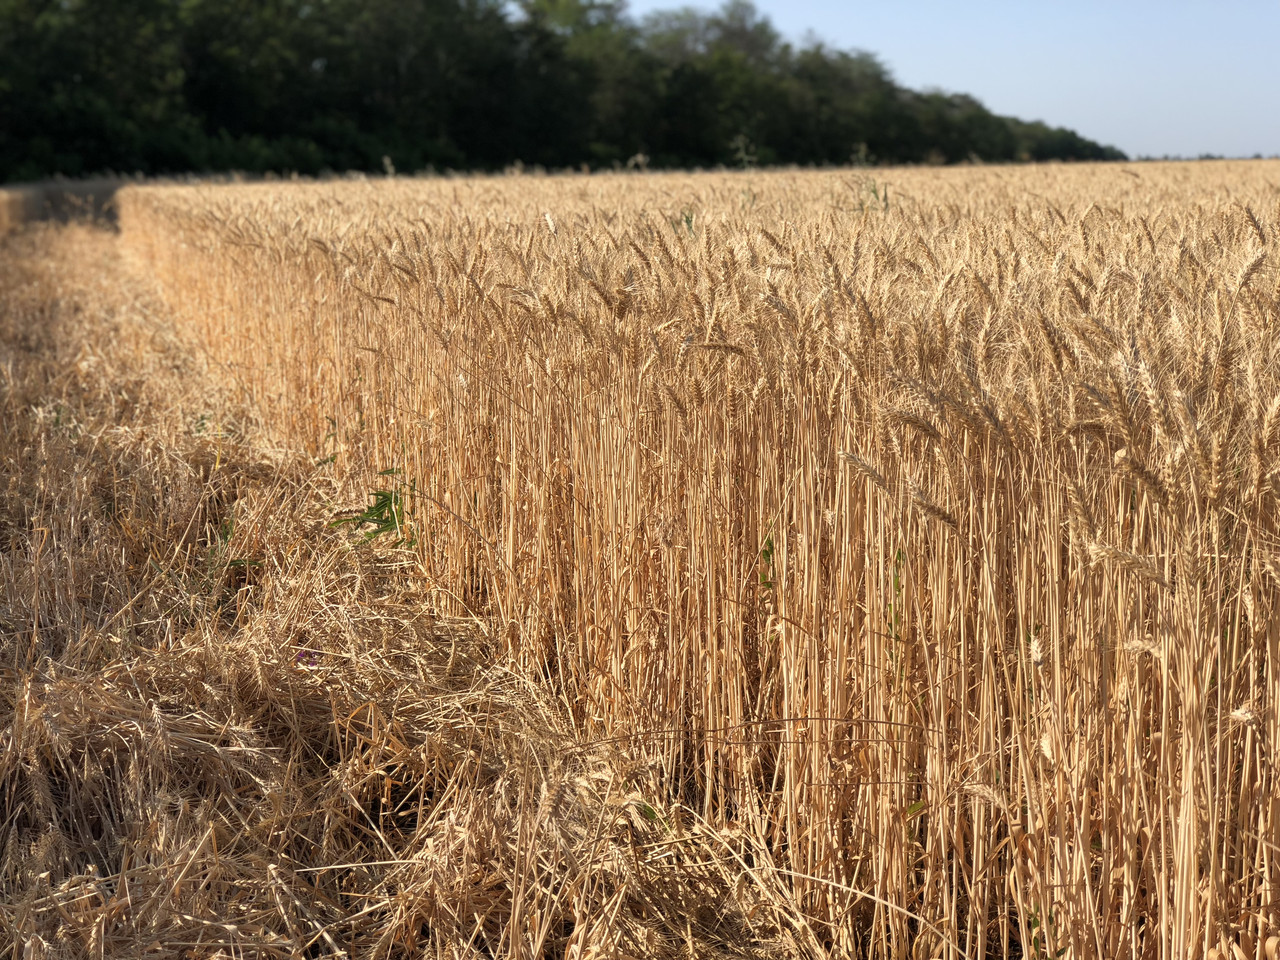 Семена пшеница озимая ШЕСТОПАЛОВКА ЭЛИТА оригинатор ЧСС ОП БОР